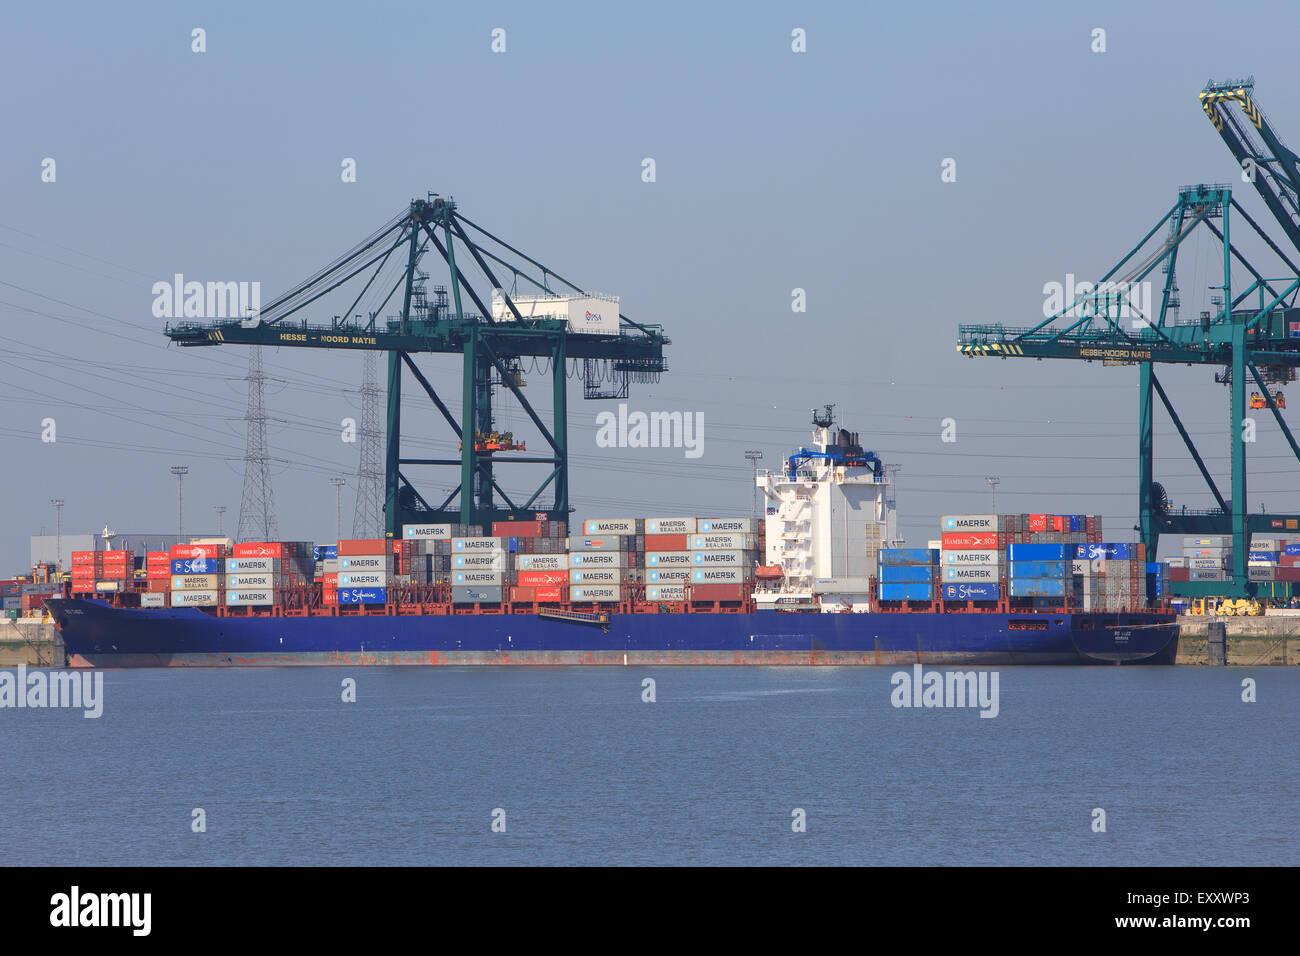 The Rio Cadiz container ship from Monrovia, Liberia moored in the Port of Antwerp, Belgium - Stock Image